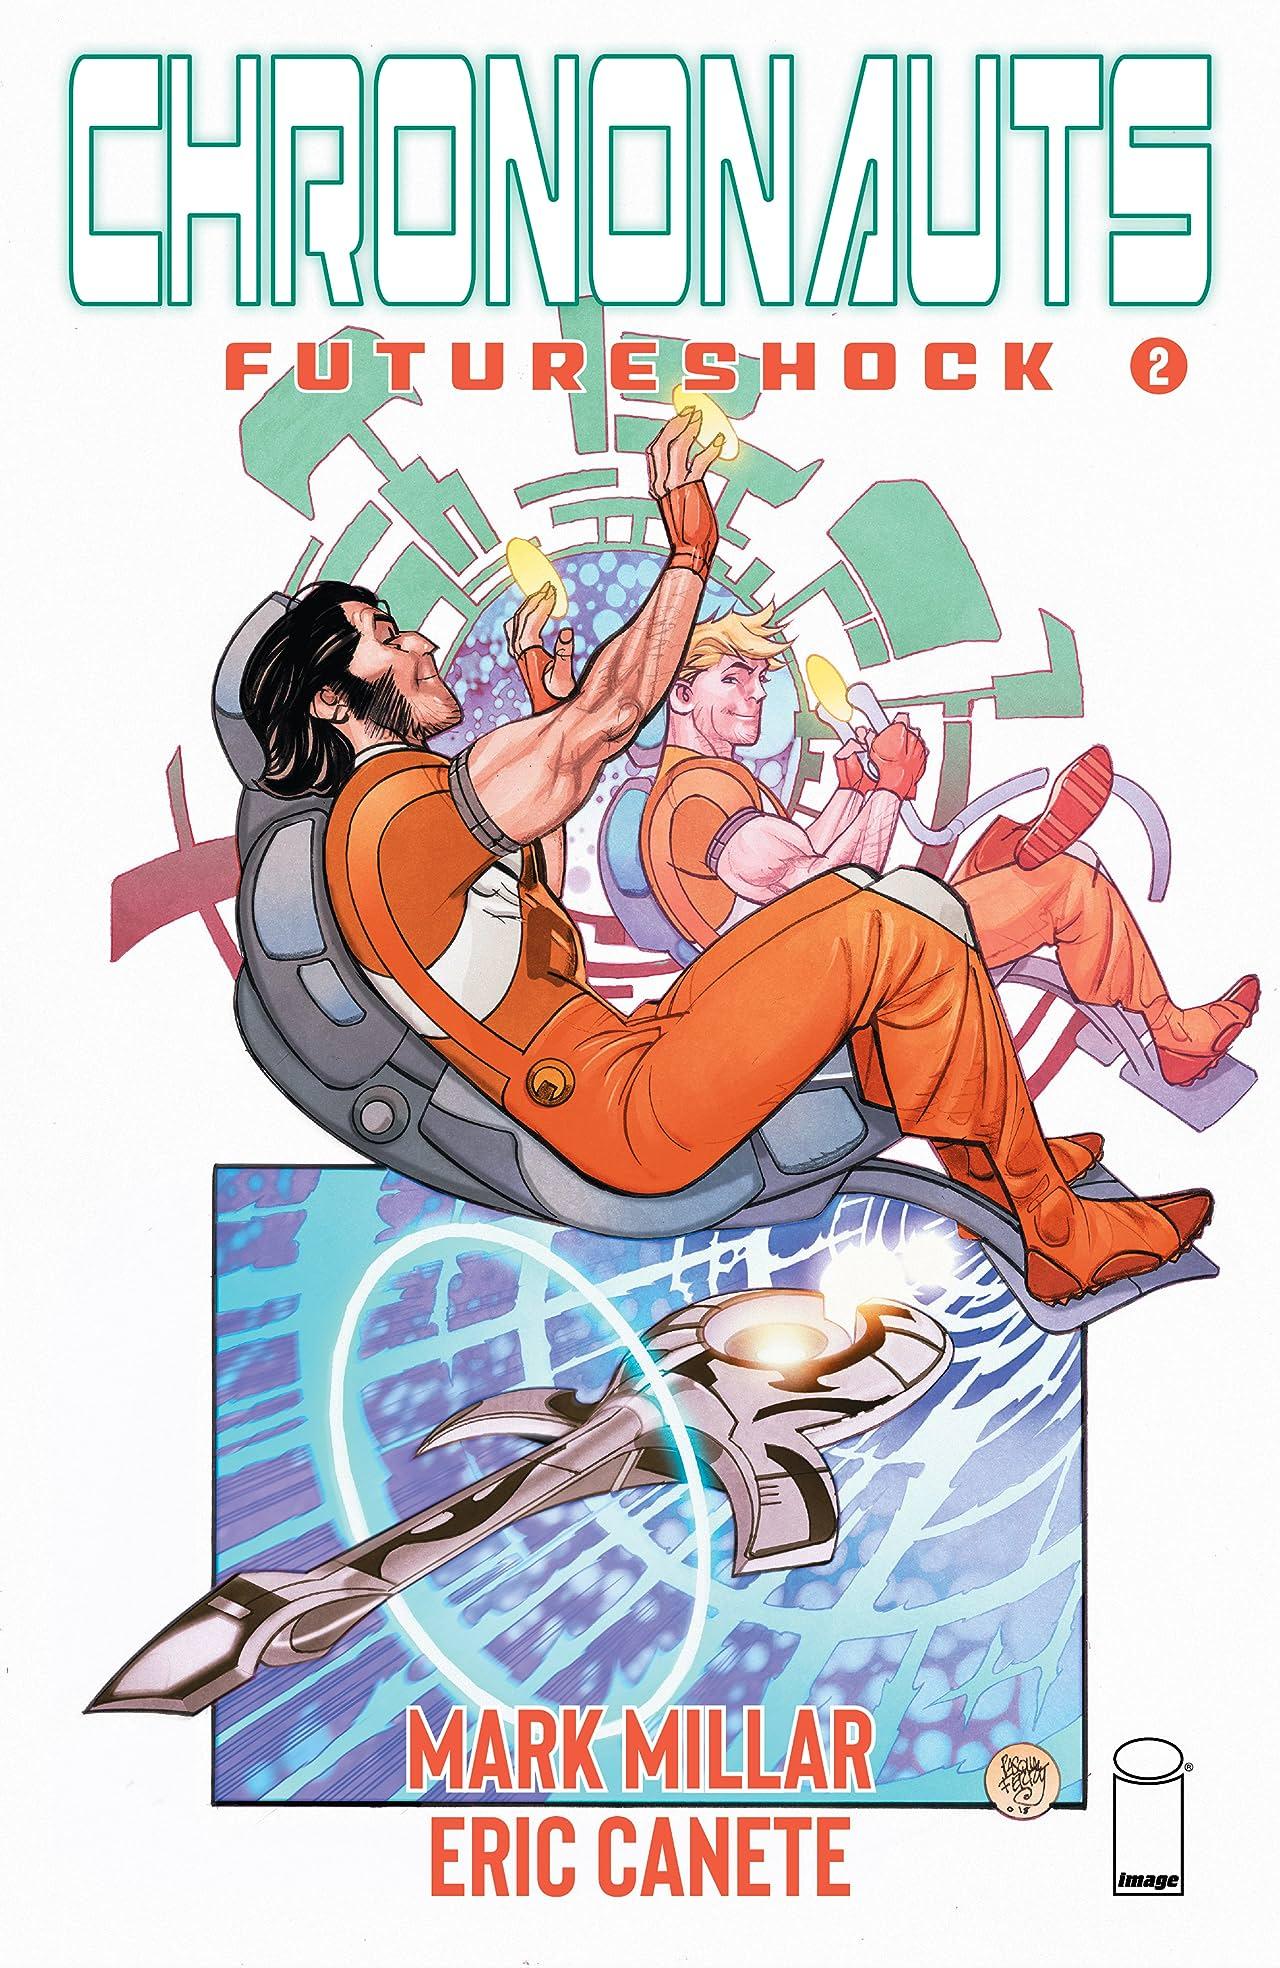 Chrononauts: Futureshock #2